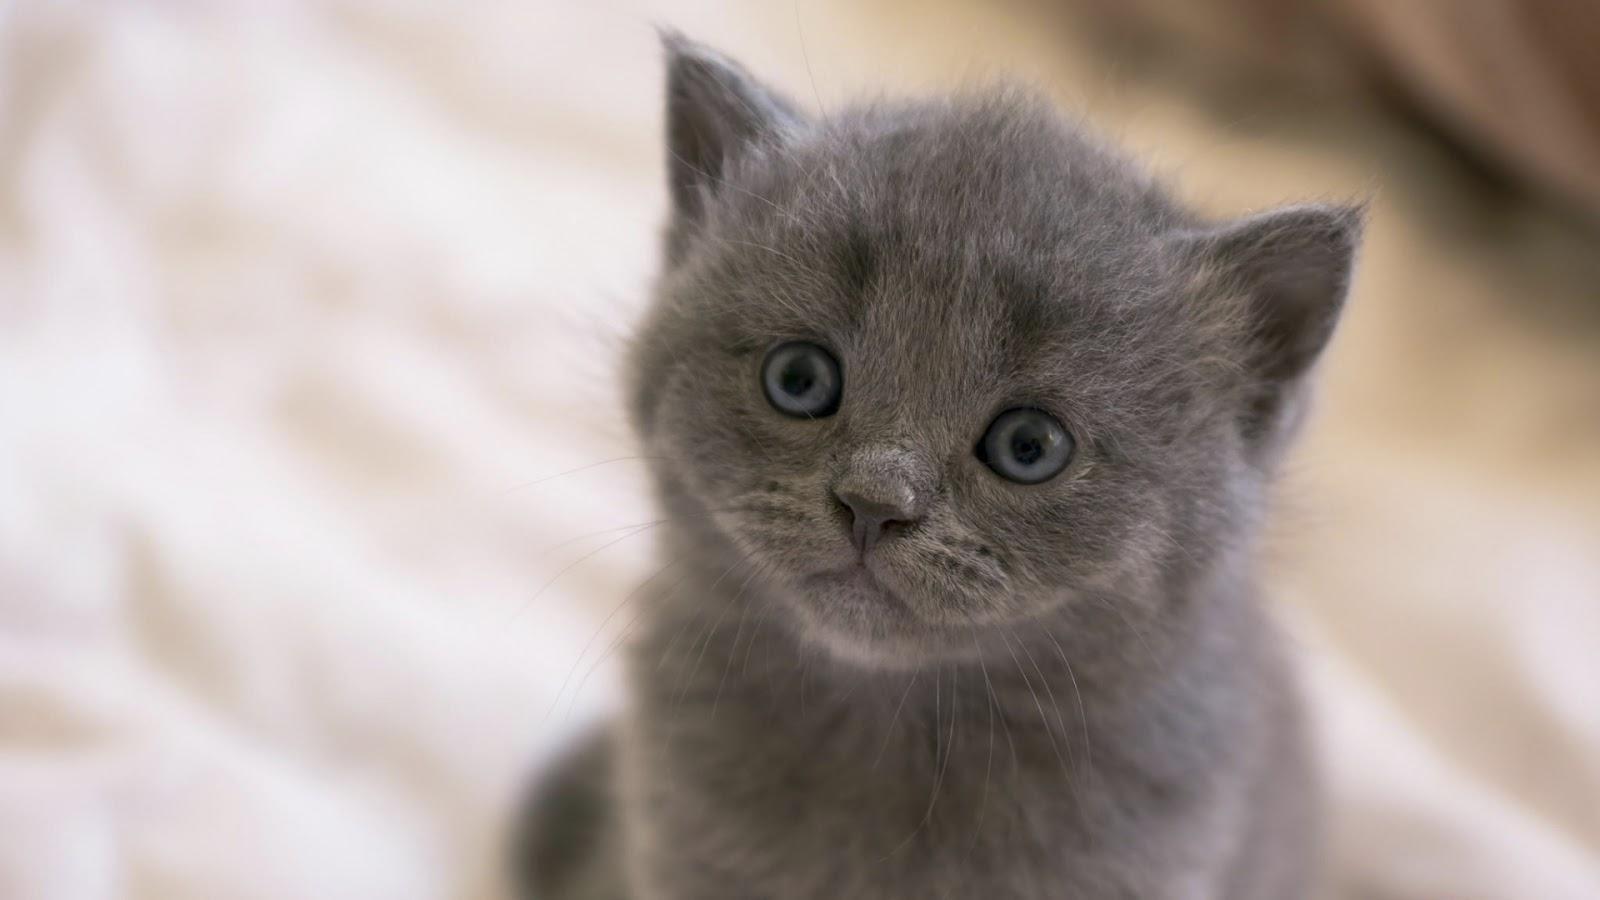 قطط,قط,بسينة,cats,photos cats, photos,beautiful cats, Wallpapers, Wallpapers cats,صور قطط,خلفيات قطط,